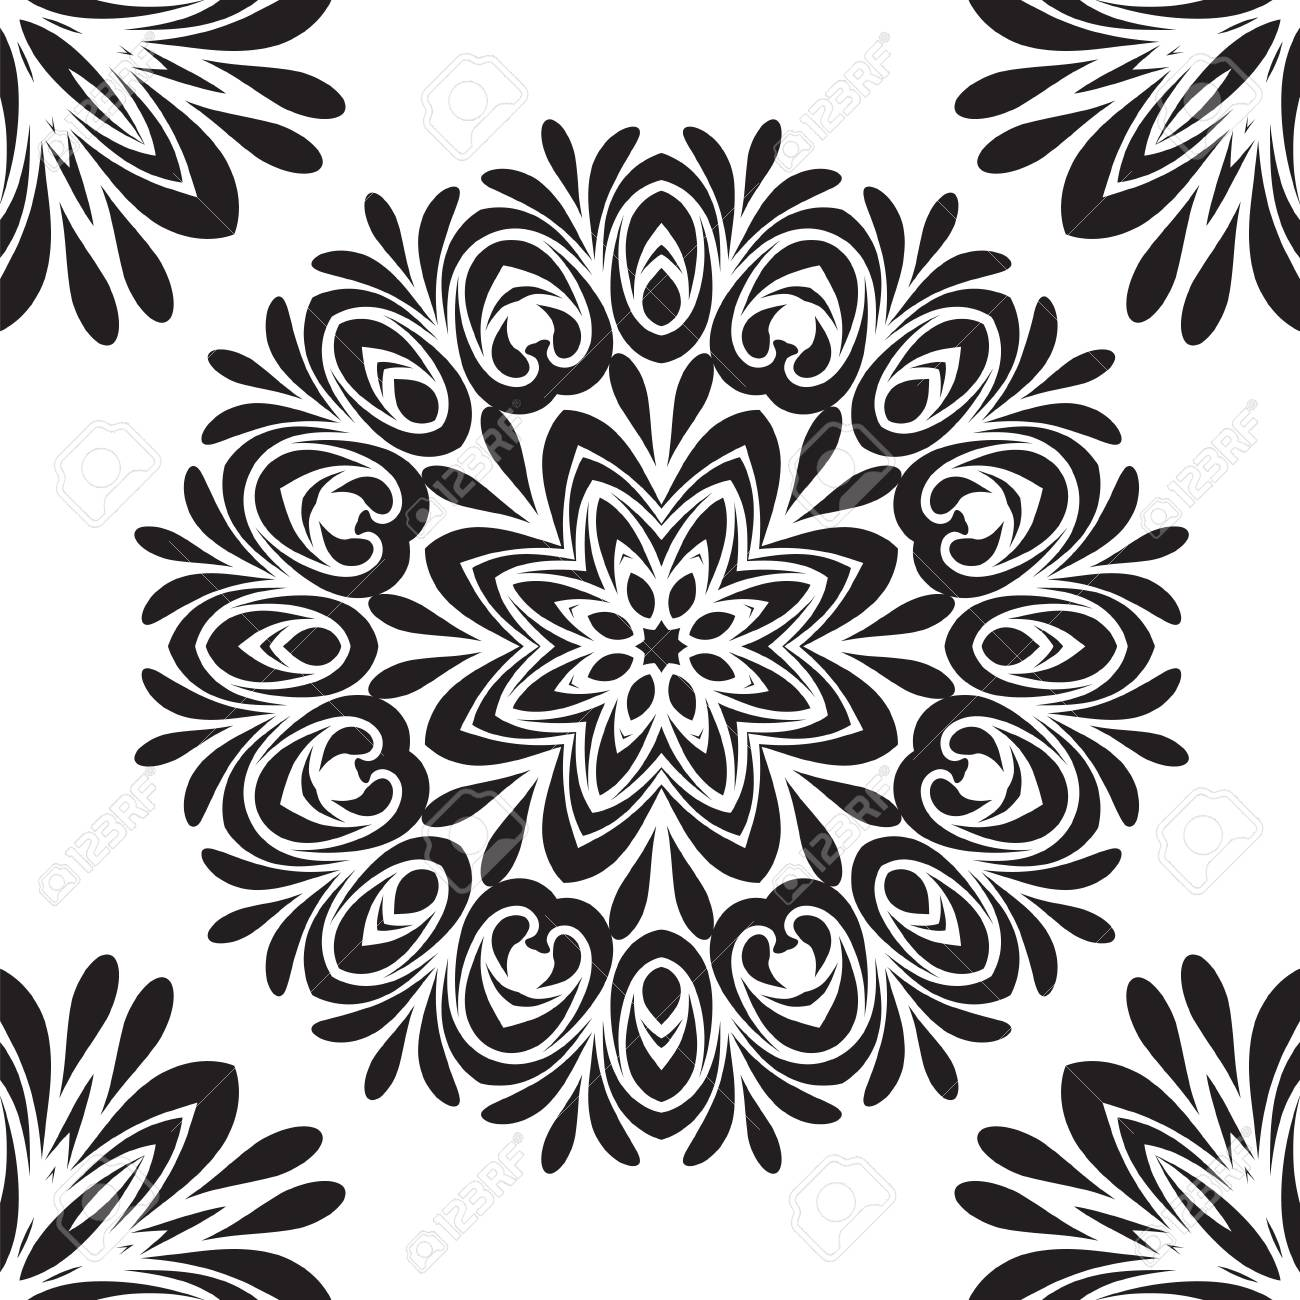 Henna Design Vector